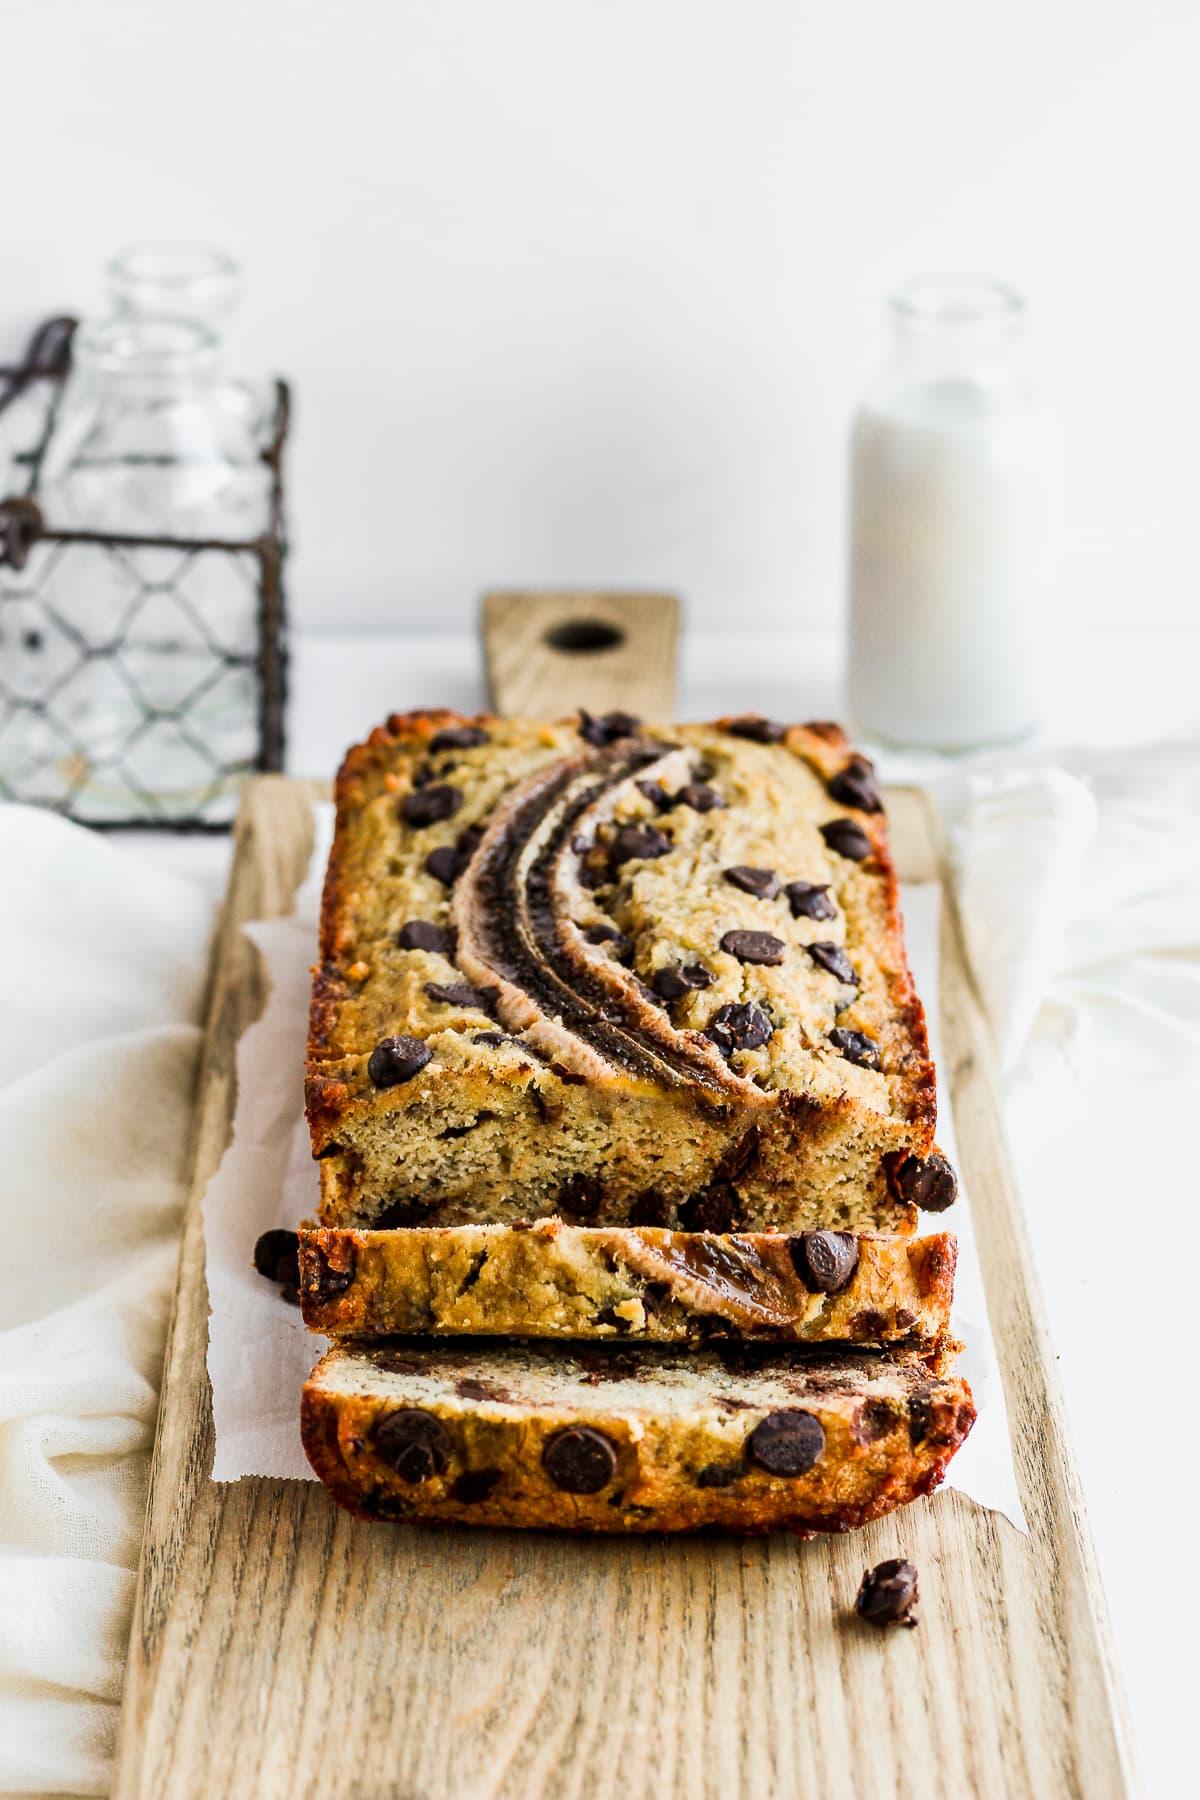 Easy Paleo Chocolate Chip Banana Bread - an easy and delicious paleo banana bread recipe the entire family will love! #bananabread #paleobananabread #glutenfreebananabread #healthybananabread #easybananabread #bestbananabread